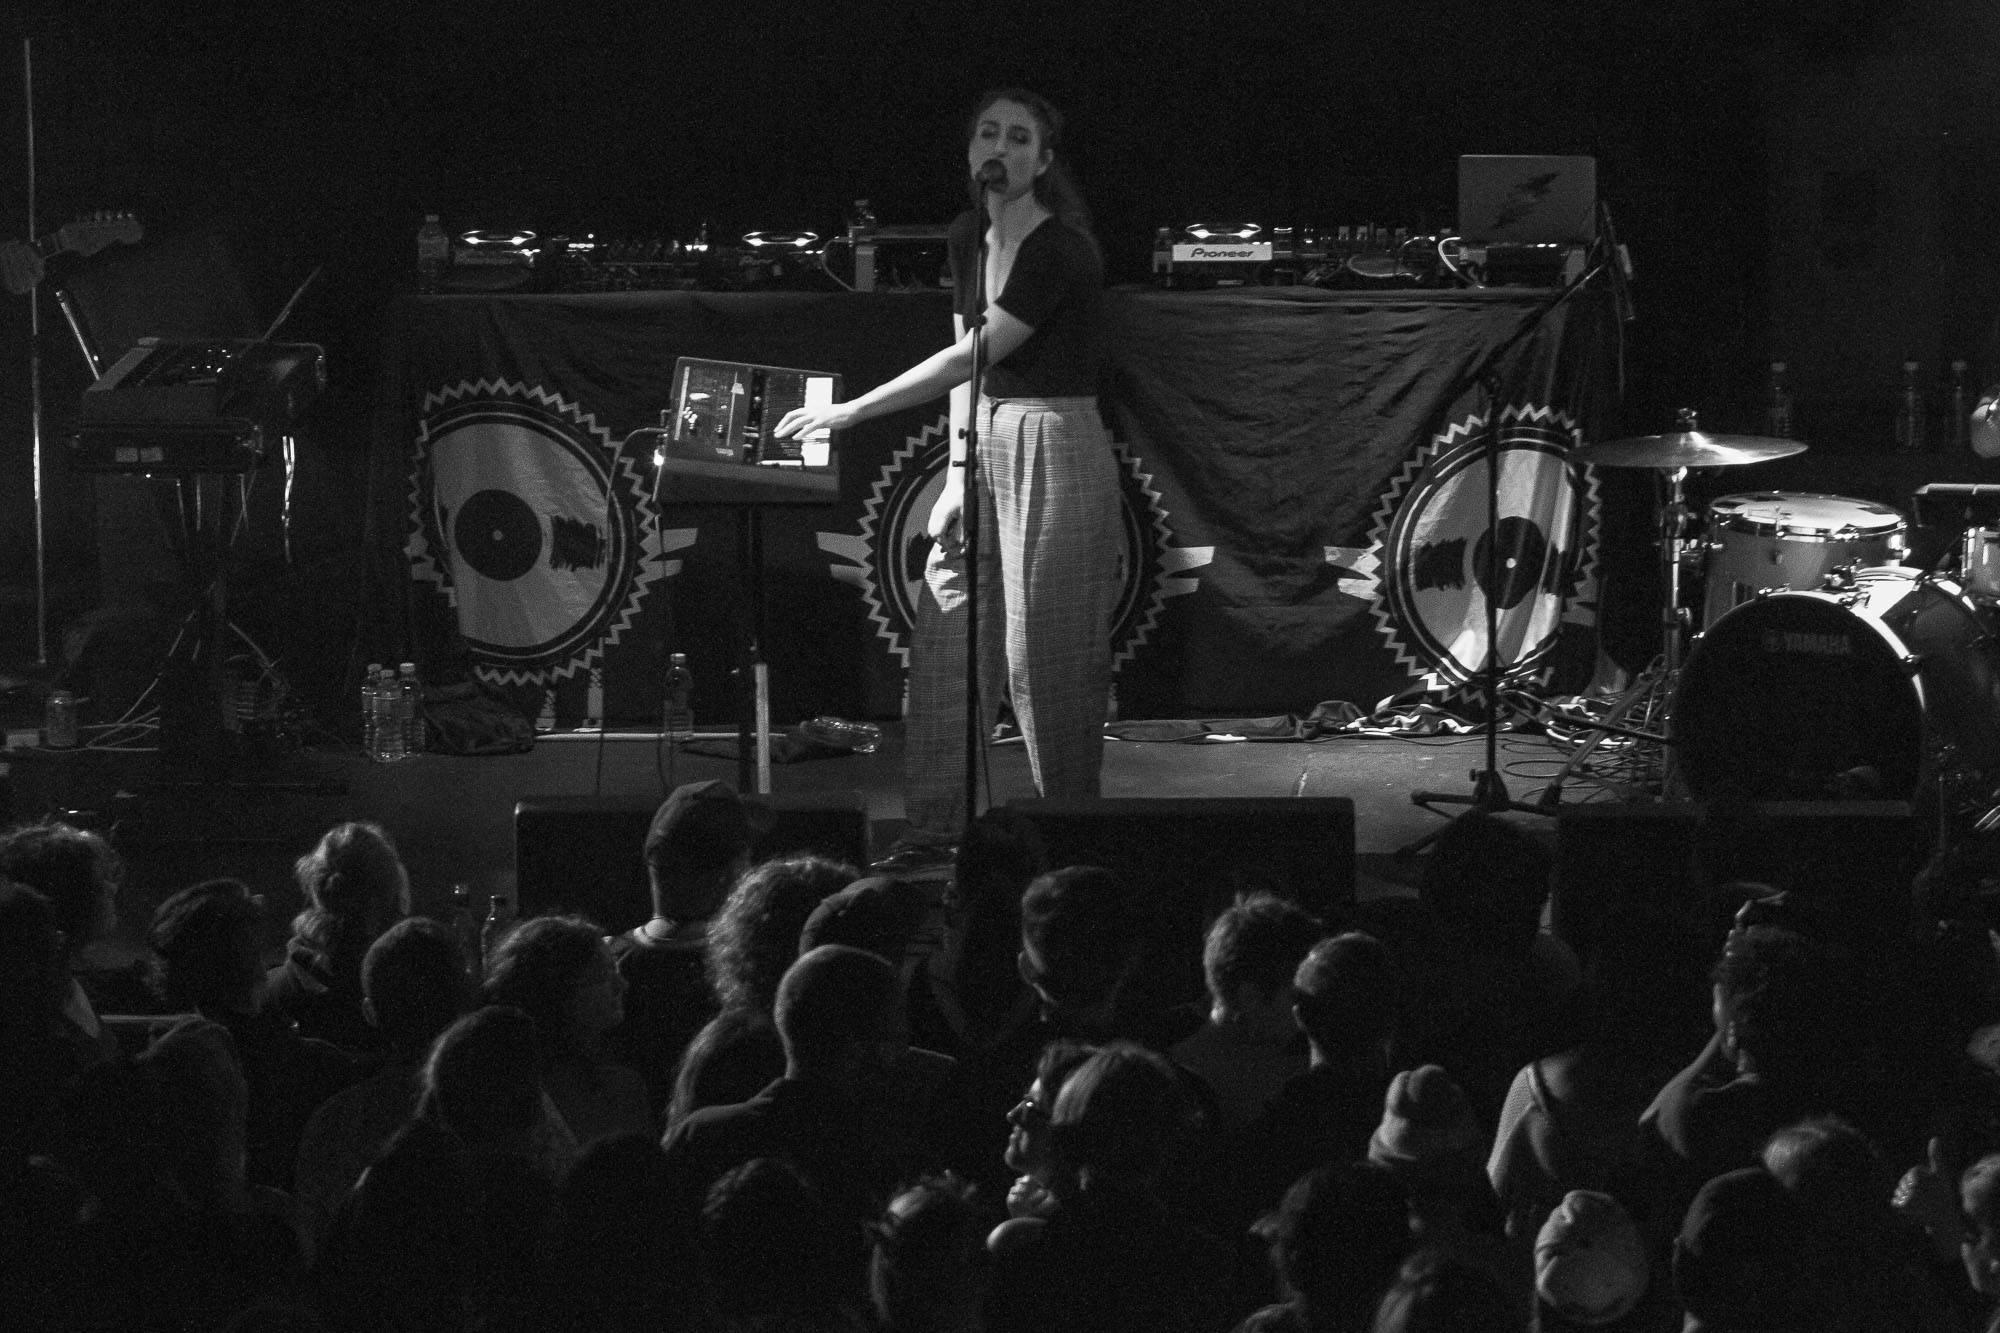 Hannah Georgas at Venue, Vancouver, Sept 17 2017. Jessica Vandergulik photo.